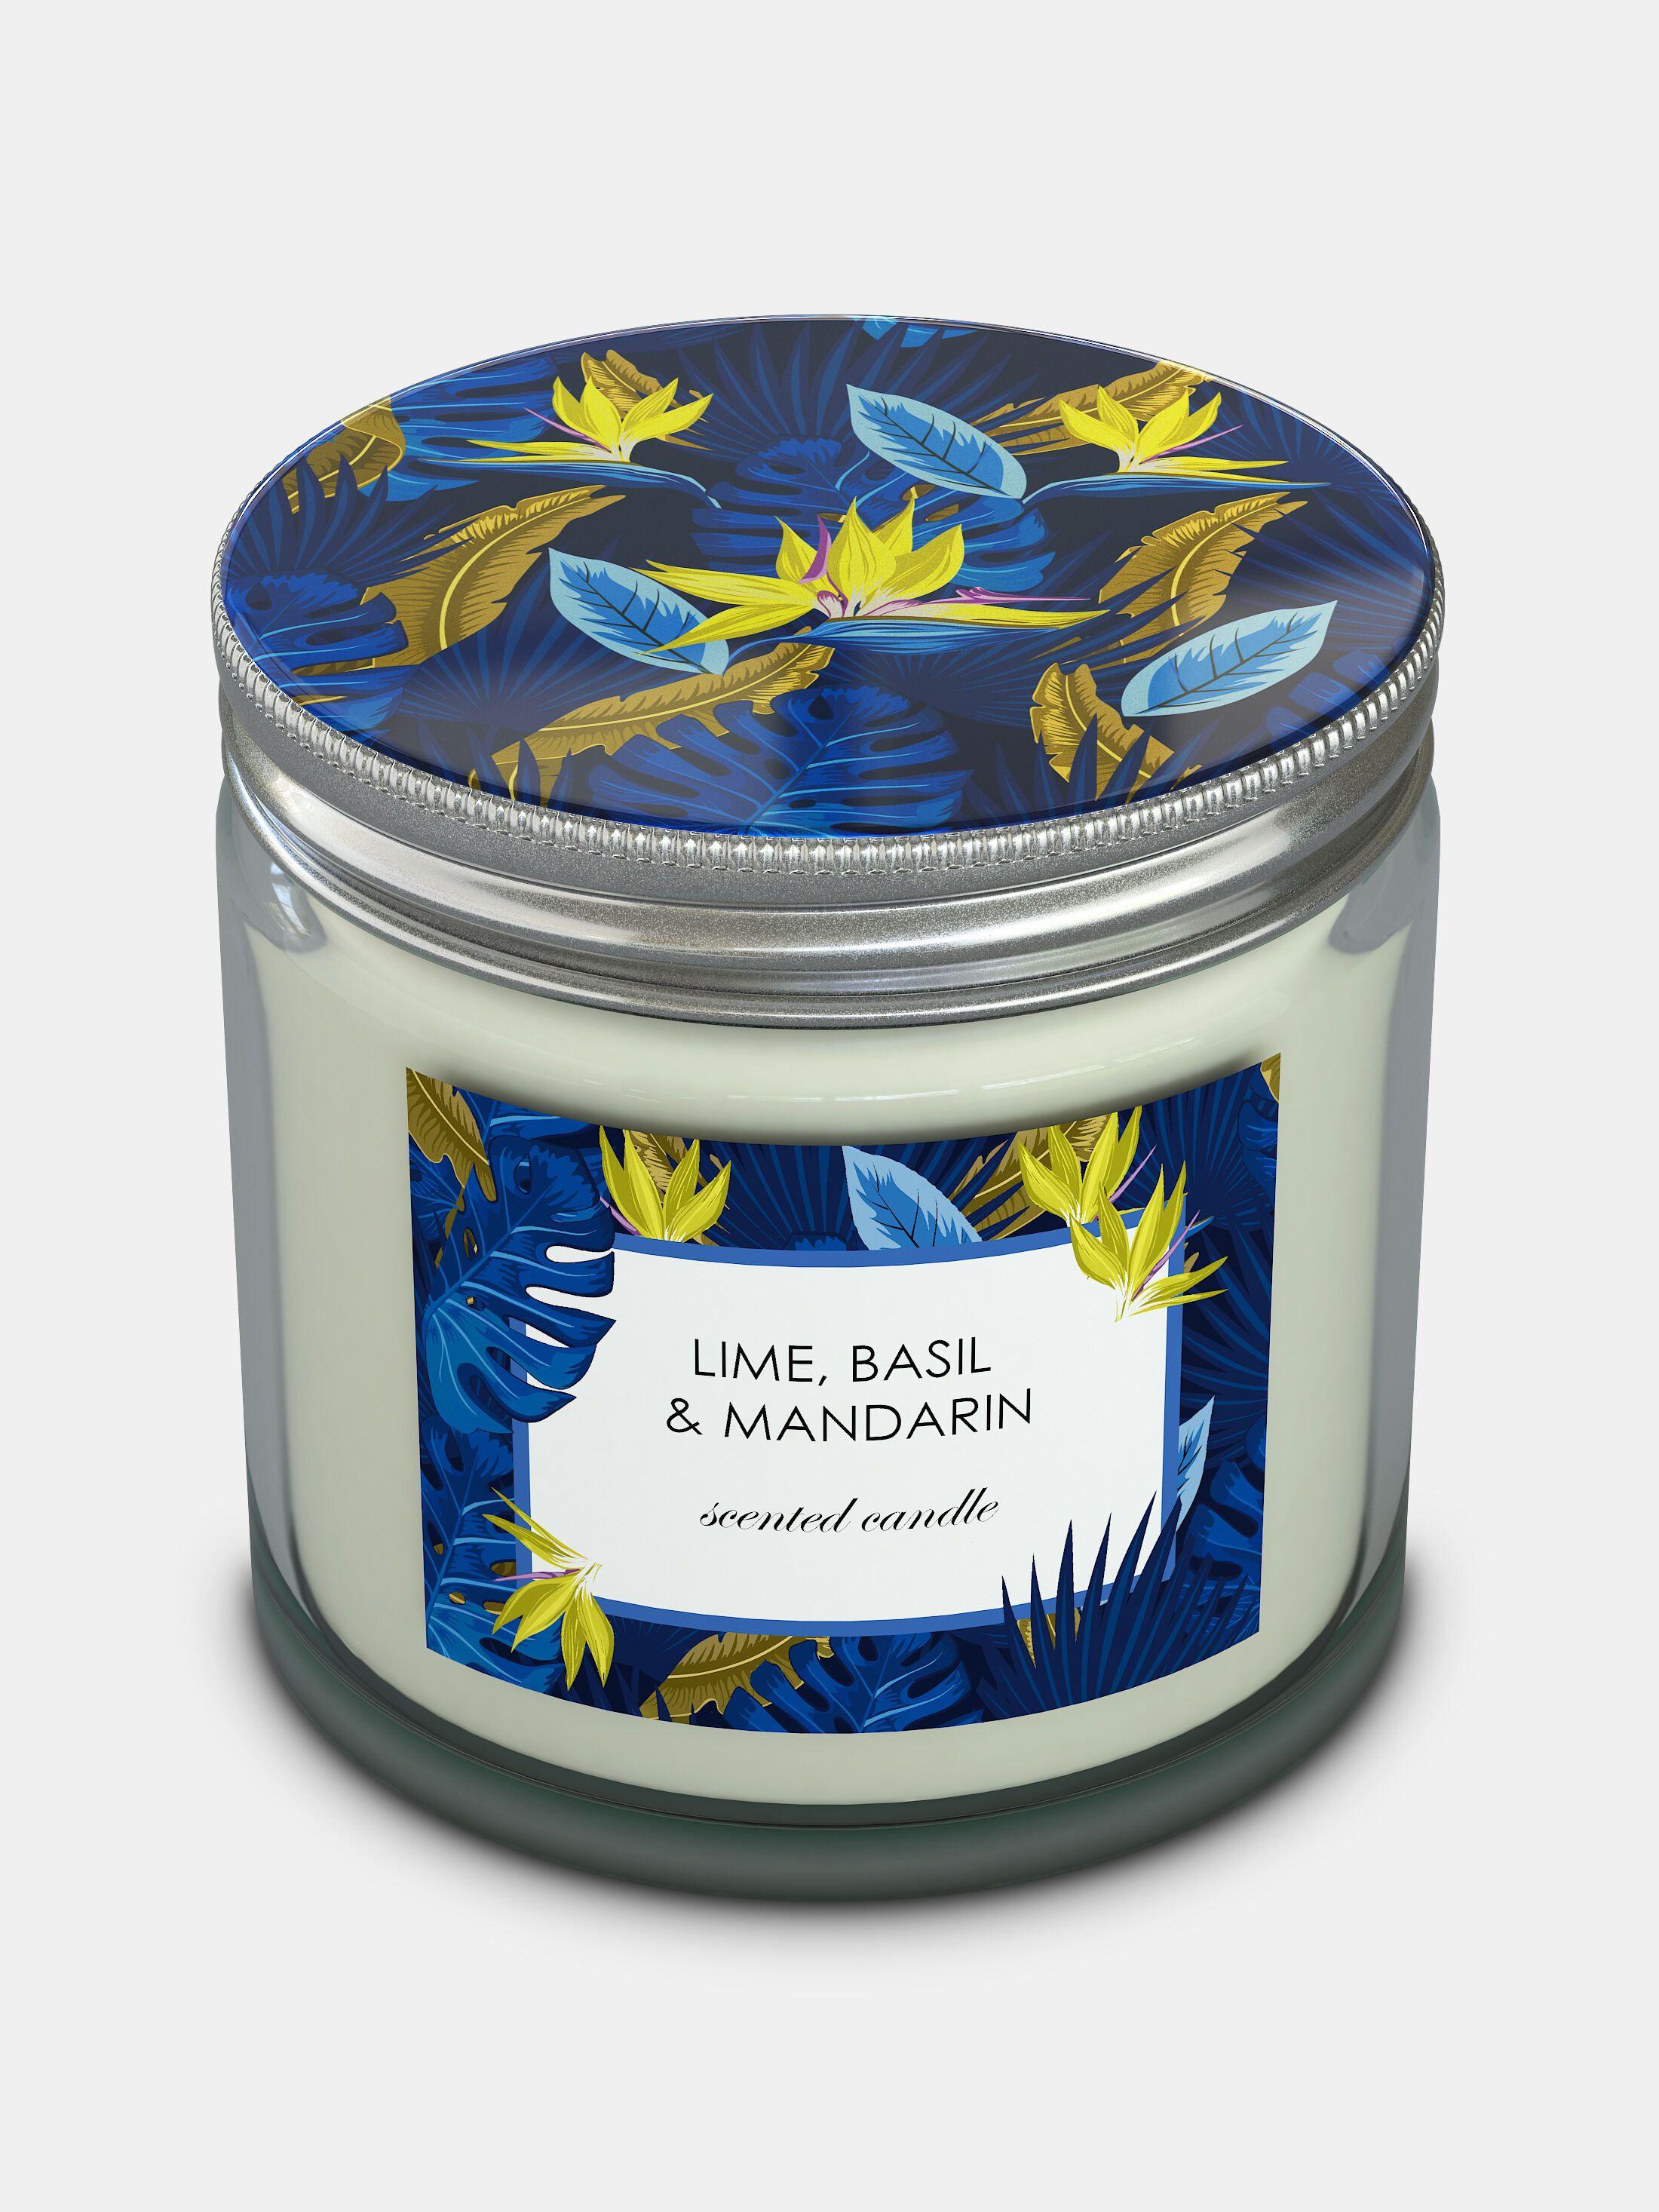 custom candle jars with lids